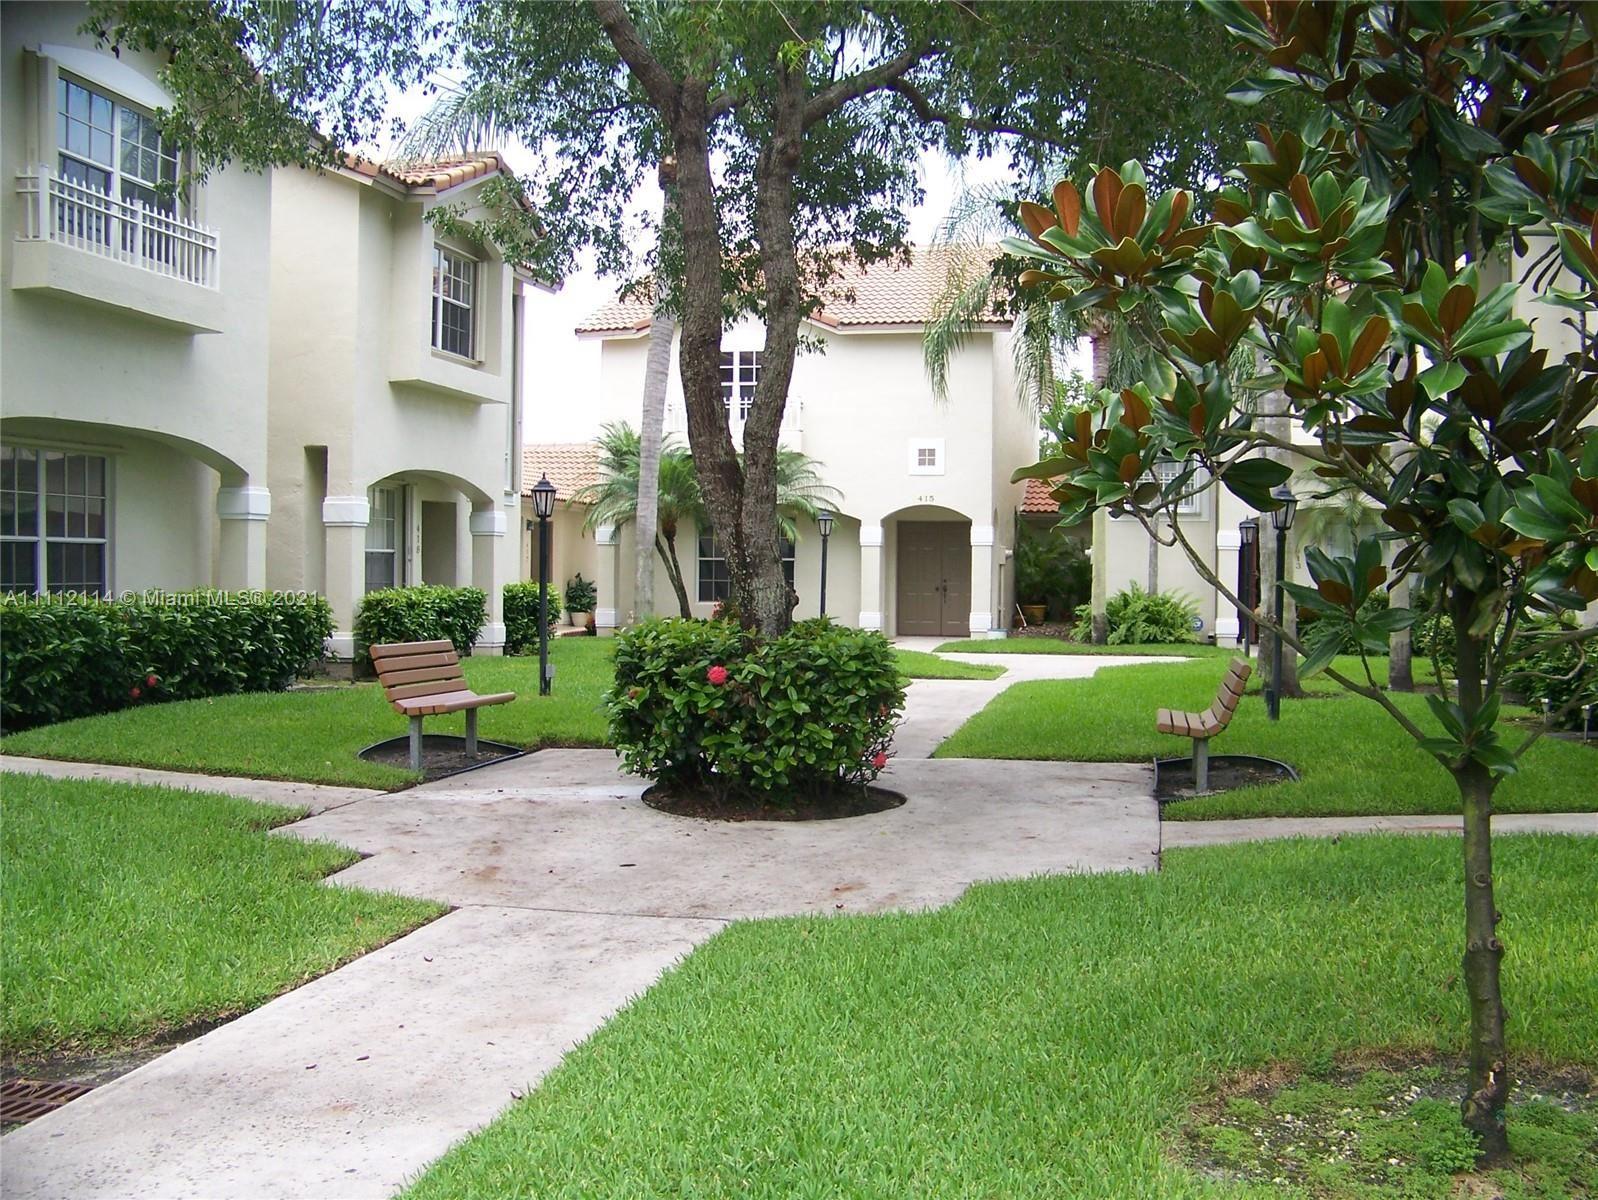 415 NW 109th Ave, Pembroke Pines, FL 33026 - #: A11112114